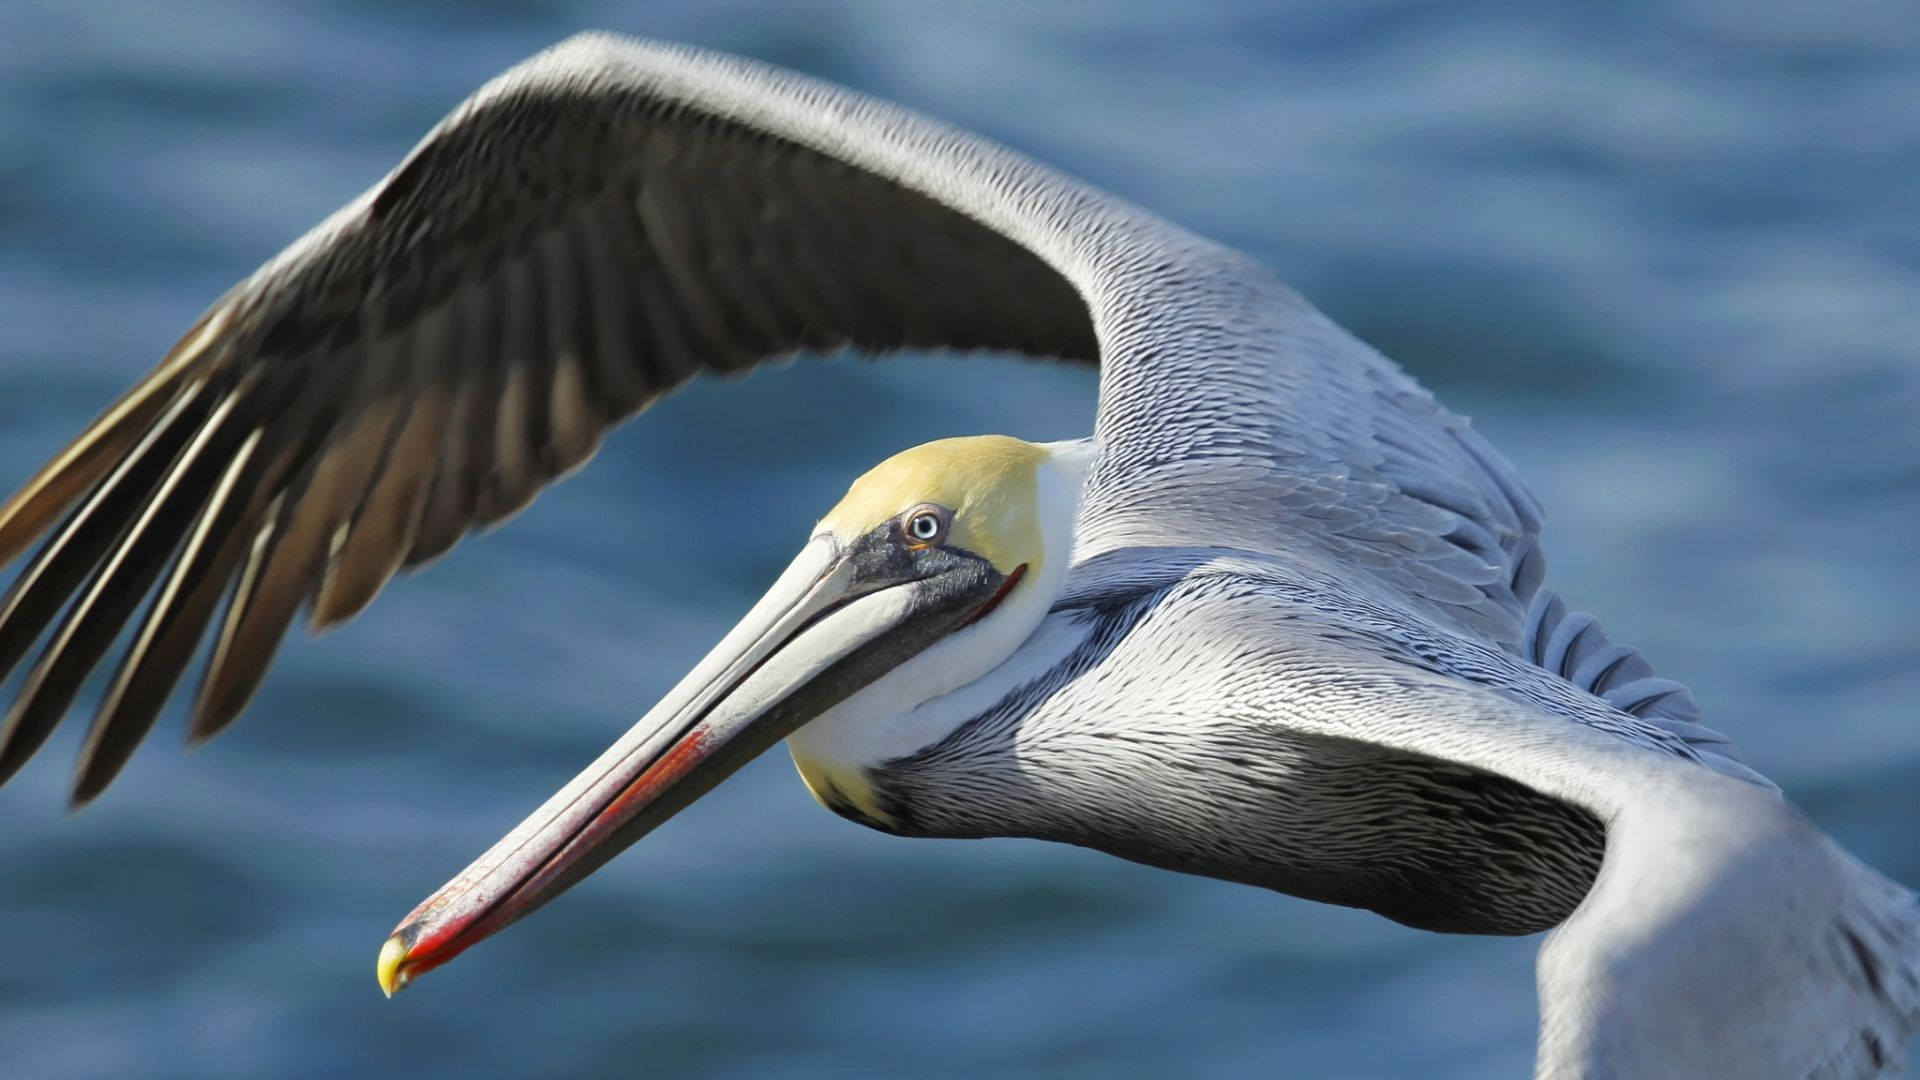 Pelican hd wallpaper 1080